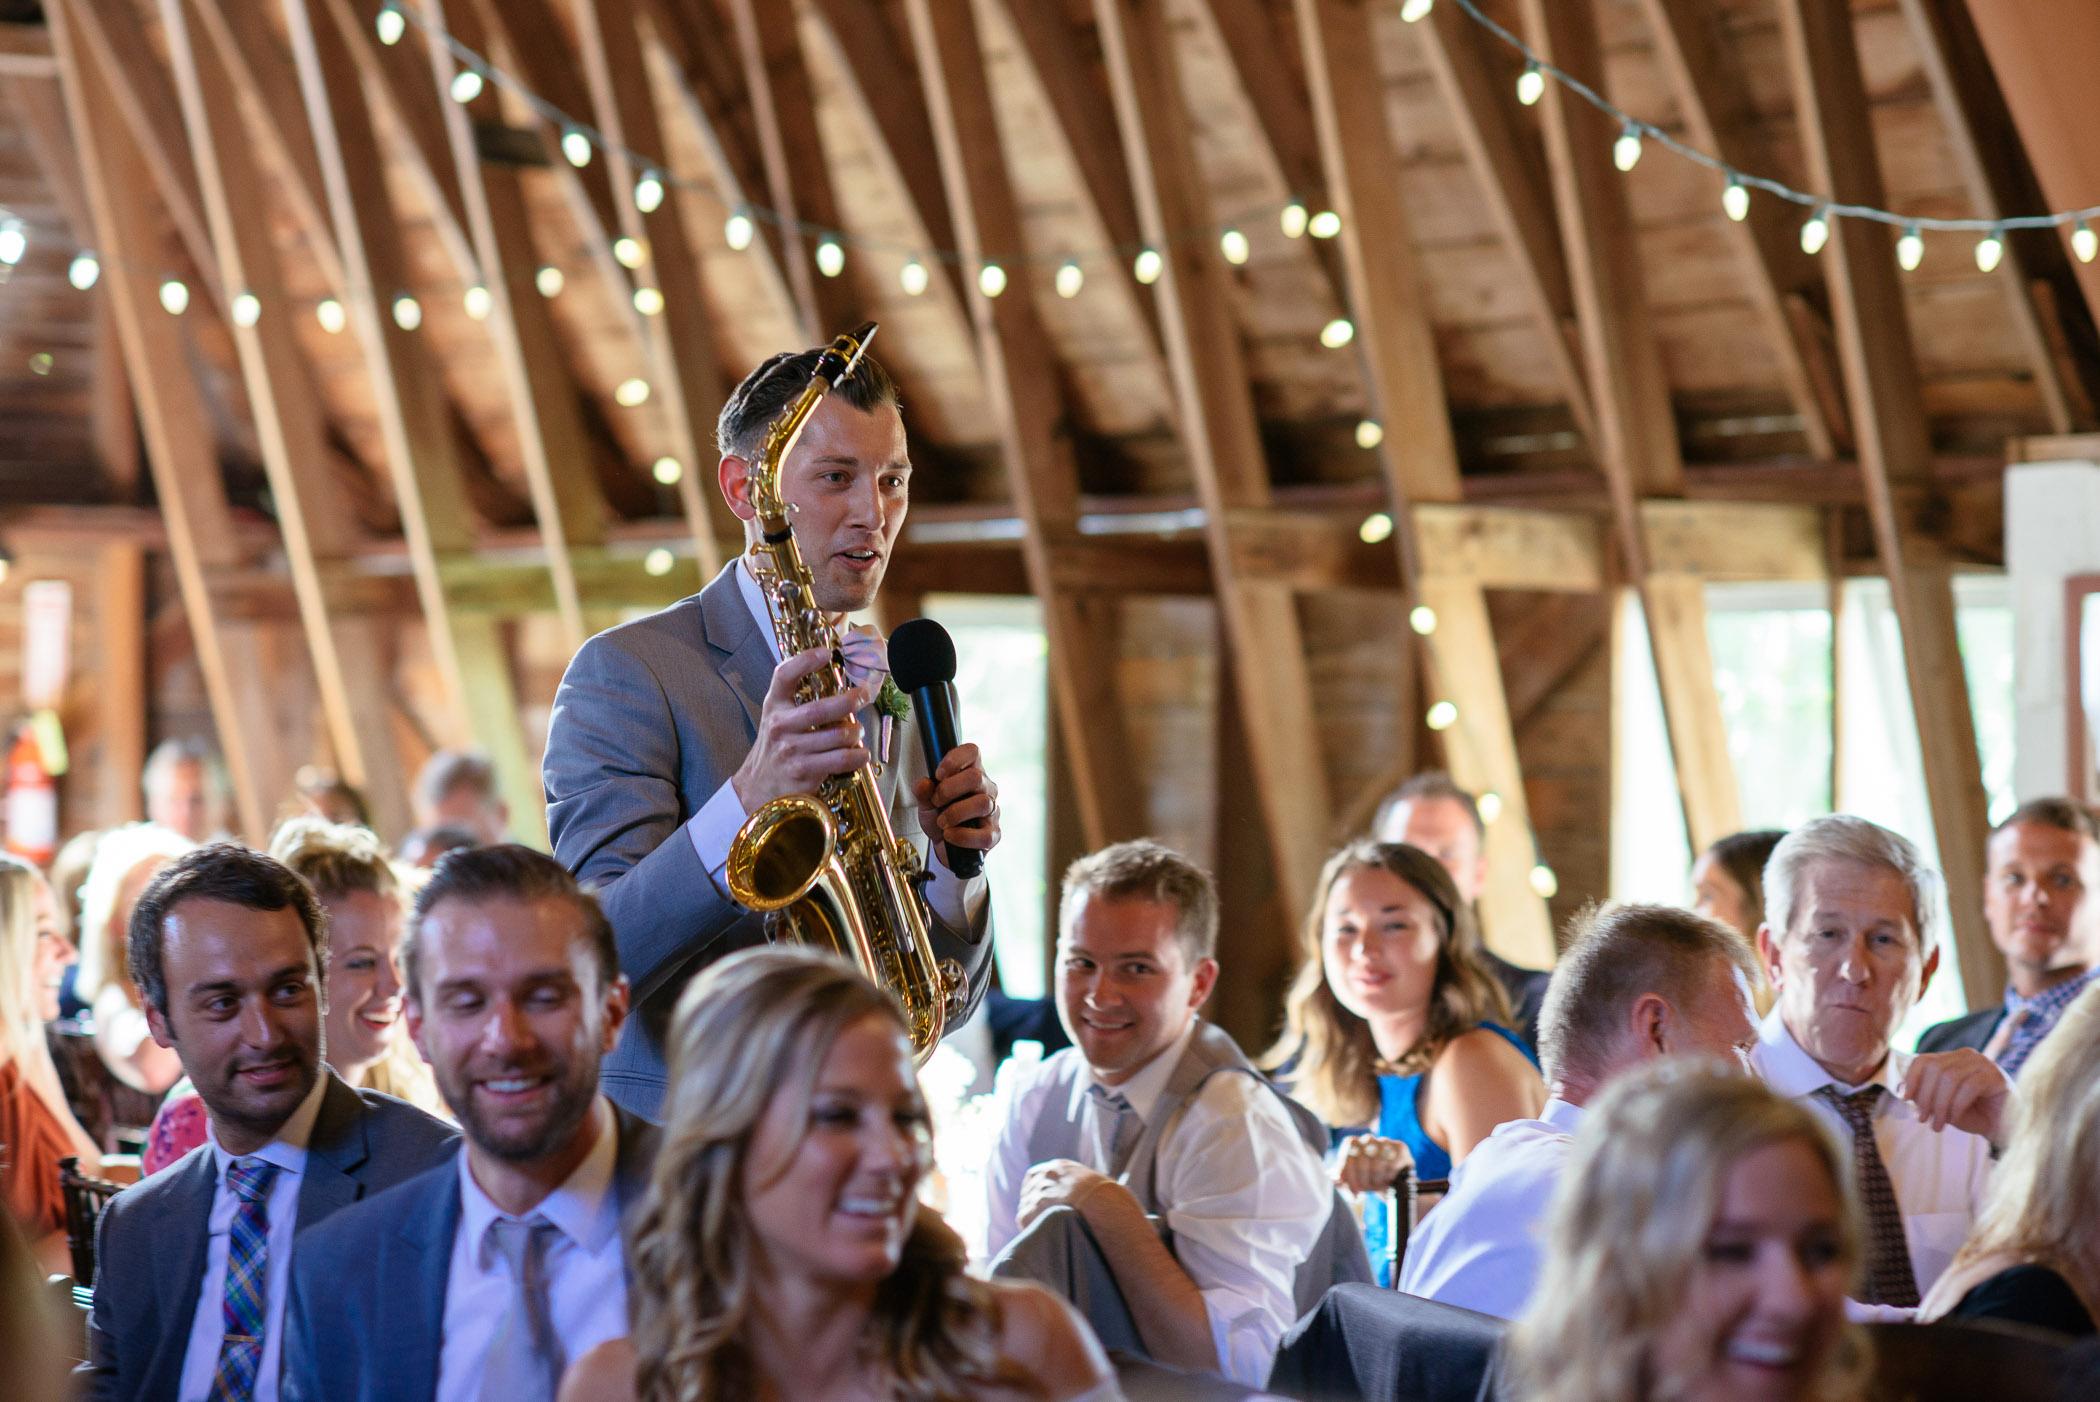 michigan_wedding_at_blue_dress_barn_039.jpg